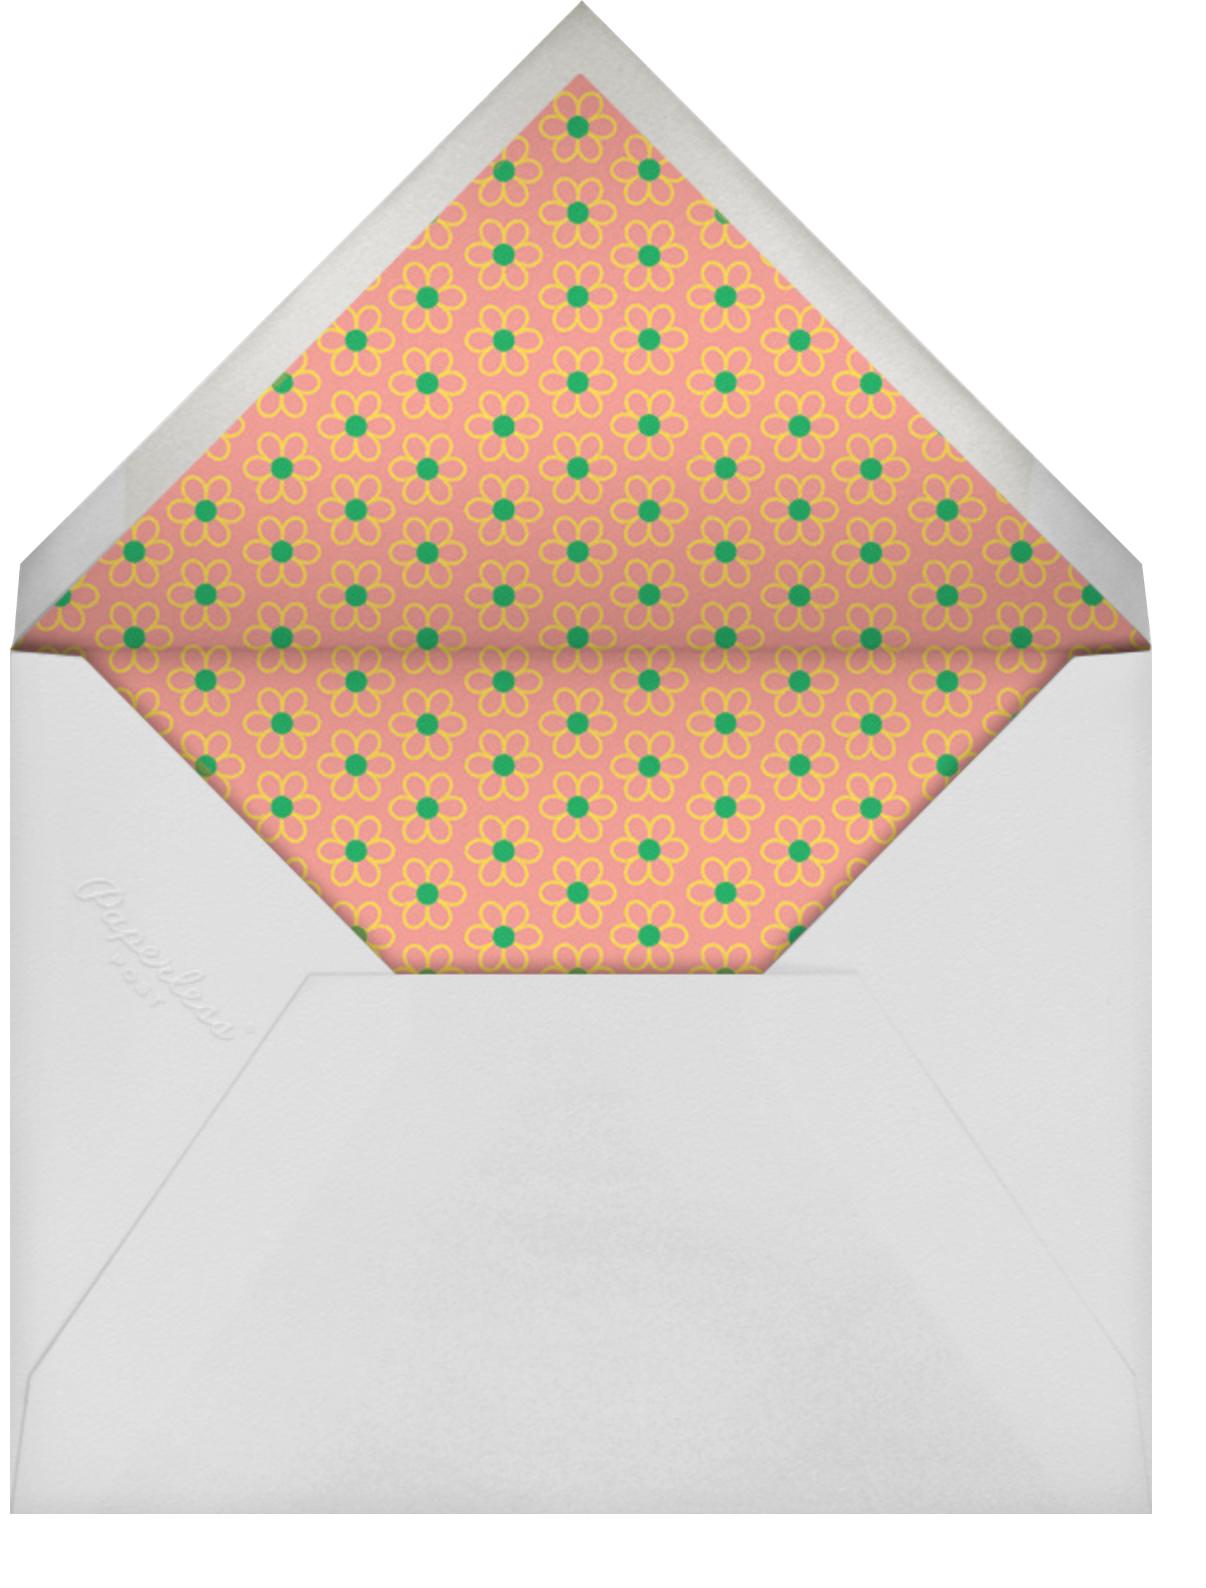 B.Y.O.C. - Paperless Post - Summer entertaining - envelope back